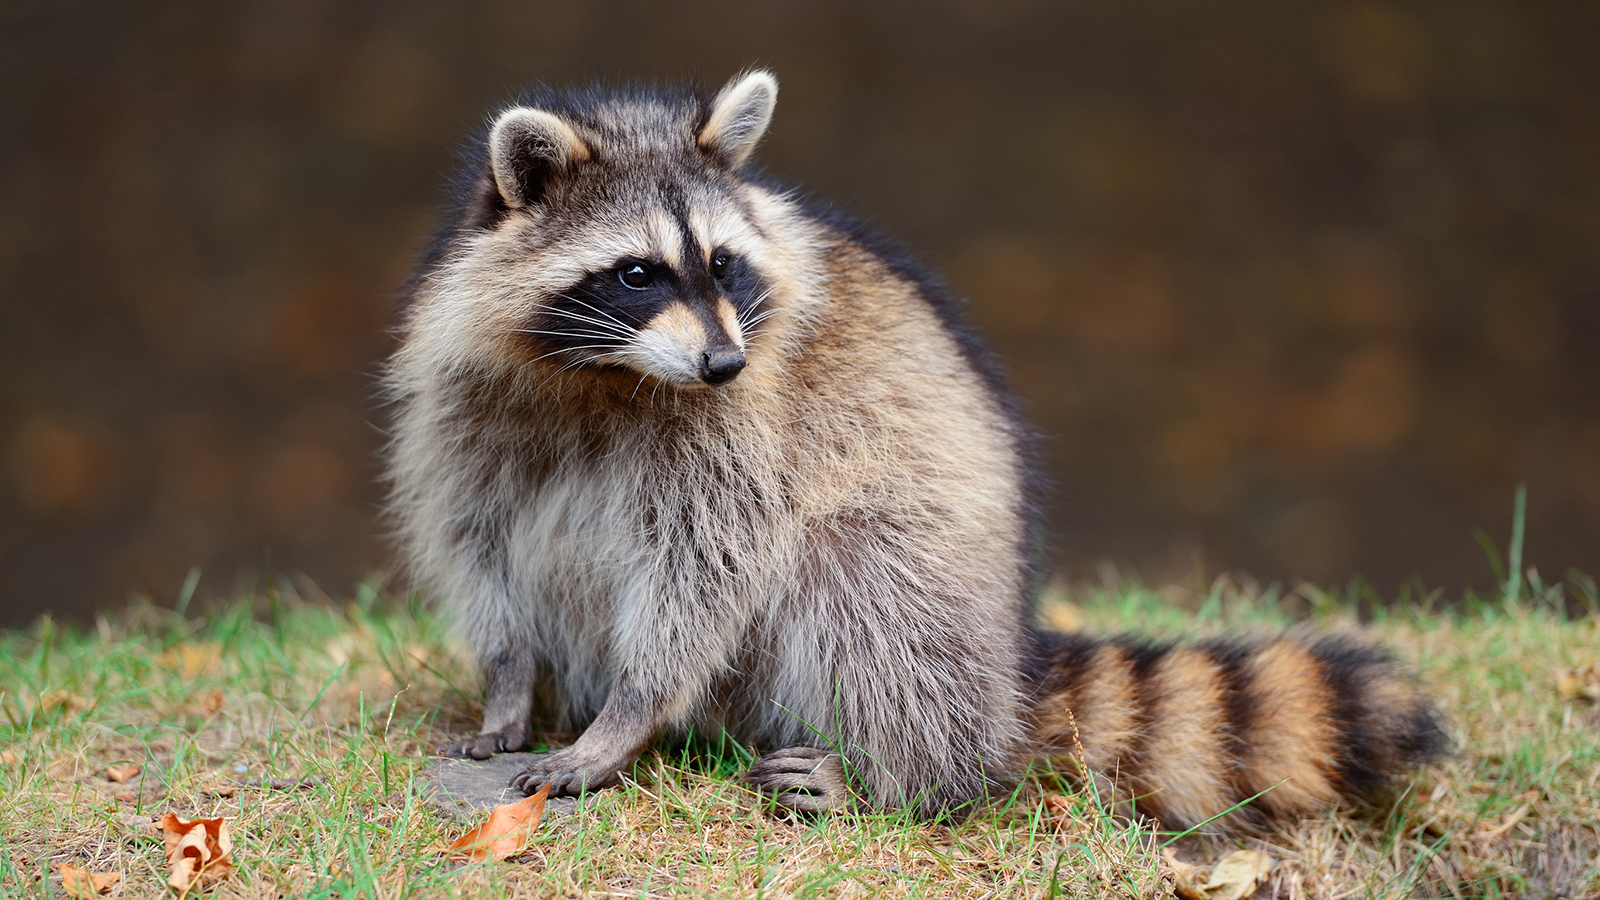 Raccoon Backgrounds, Compatible - PC, Mobile, Gadgets| 1600x900 px